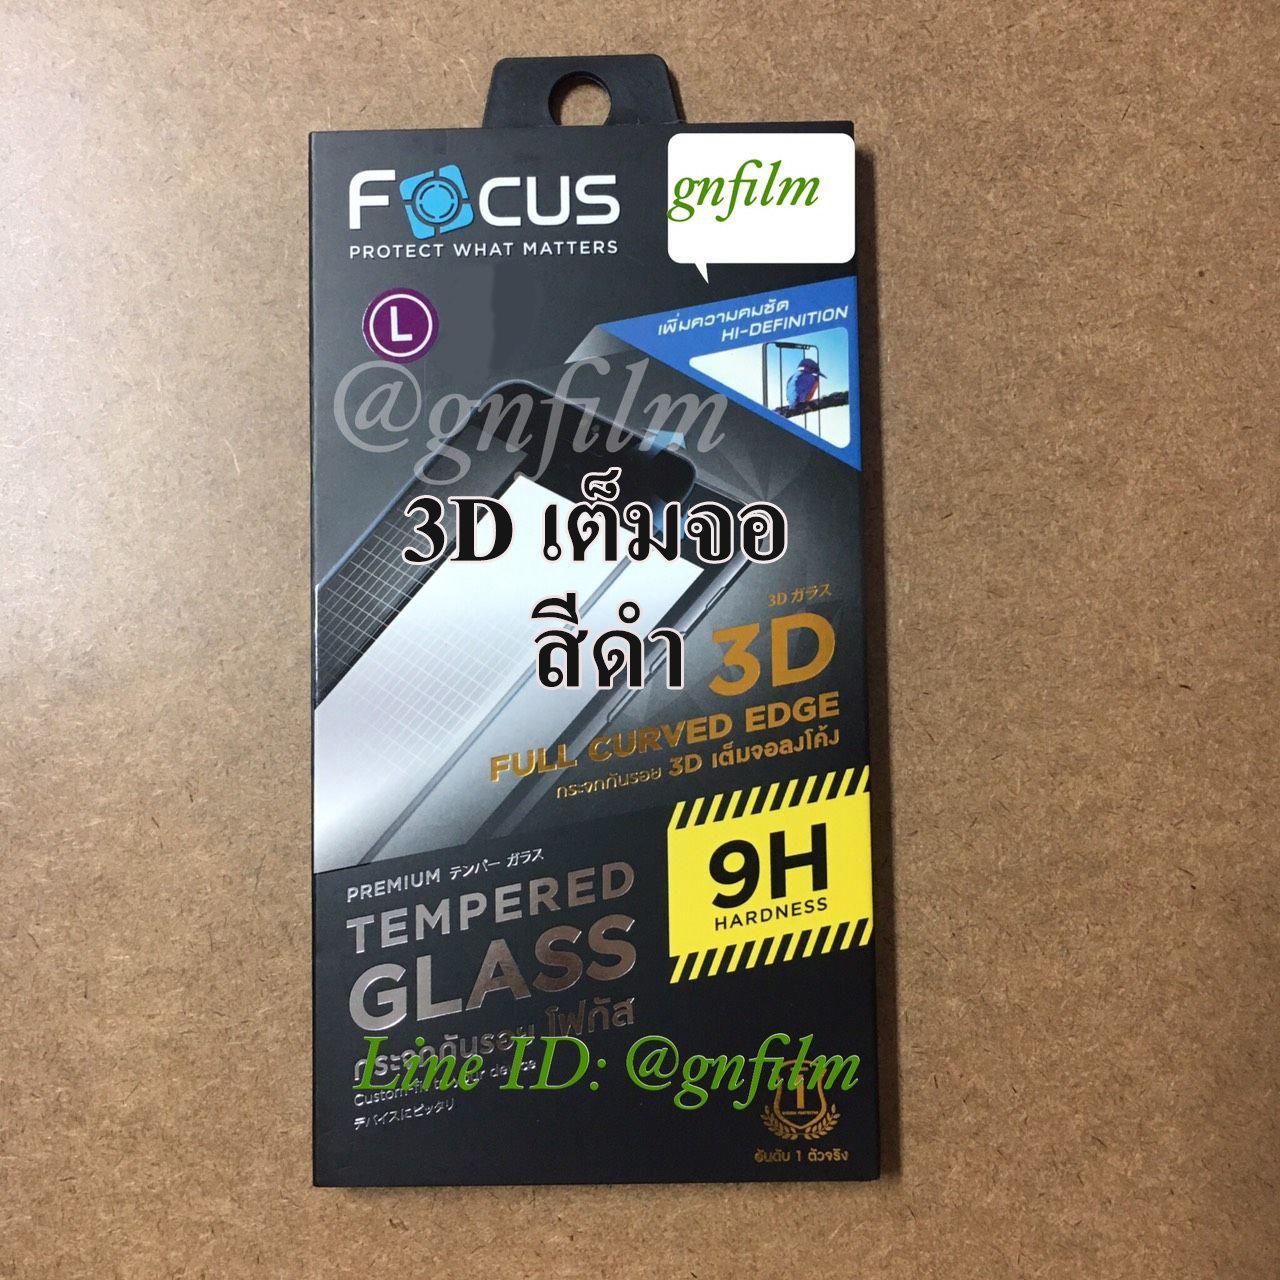 Iphone 11 Pro Max - กระจกนิรภัยแบบเต็มจอลงโค้ง 3D สีดำ  Tempered Glass 3D Full Frame Black